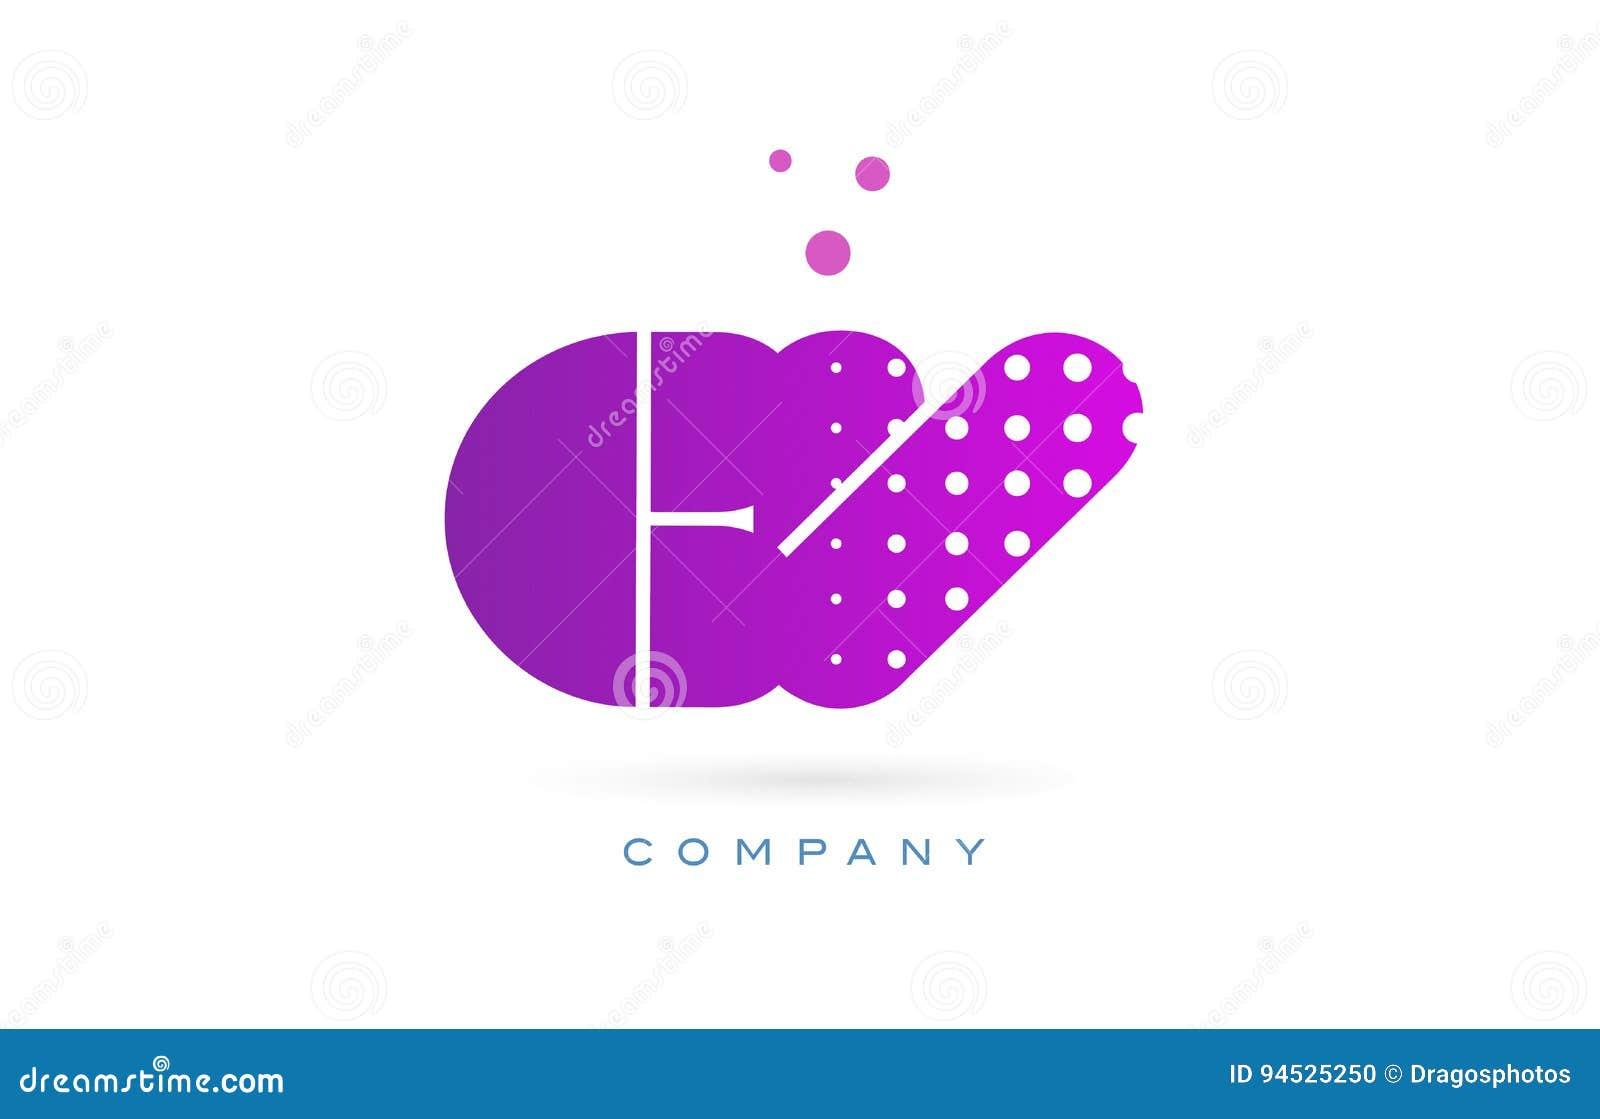 cv c v pink dots letter logo alphabet icon stock vector